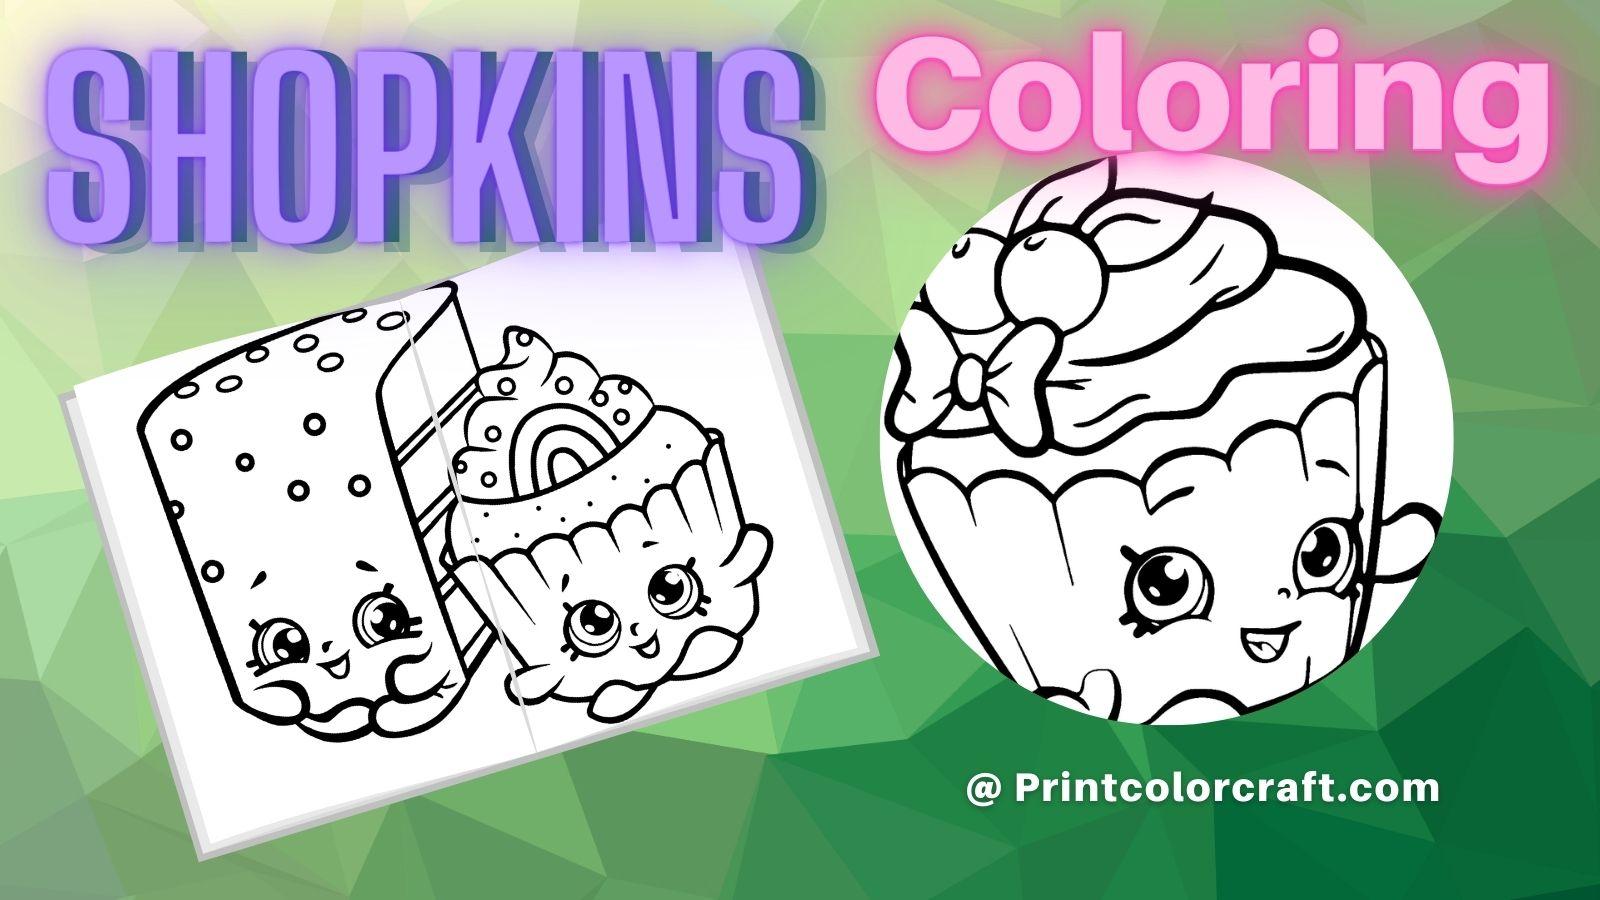 Shopkins Coloring Pages at Printcolorcraft.com